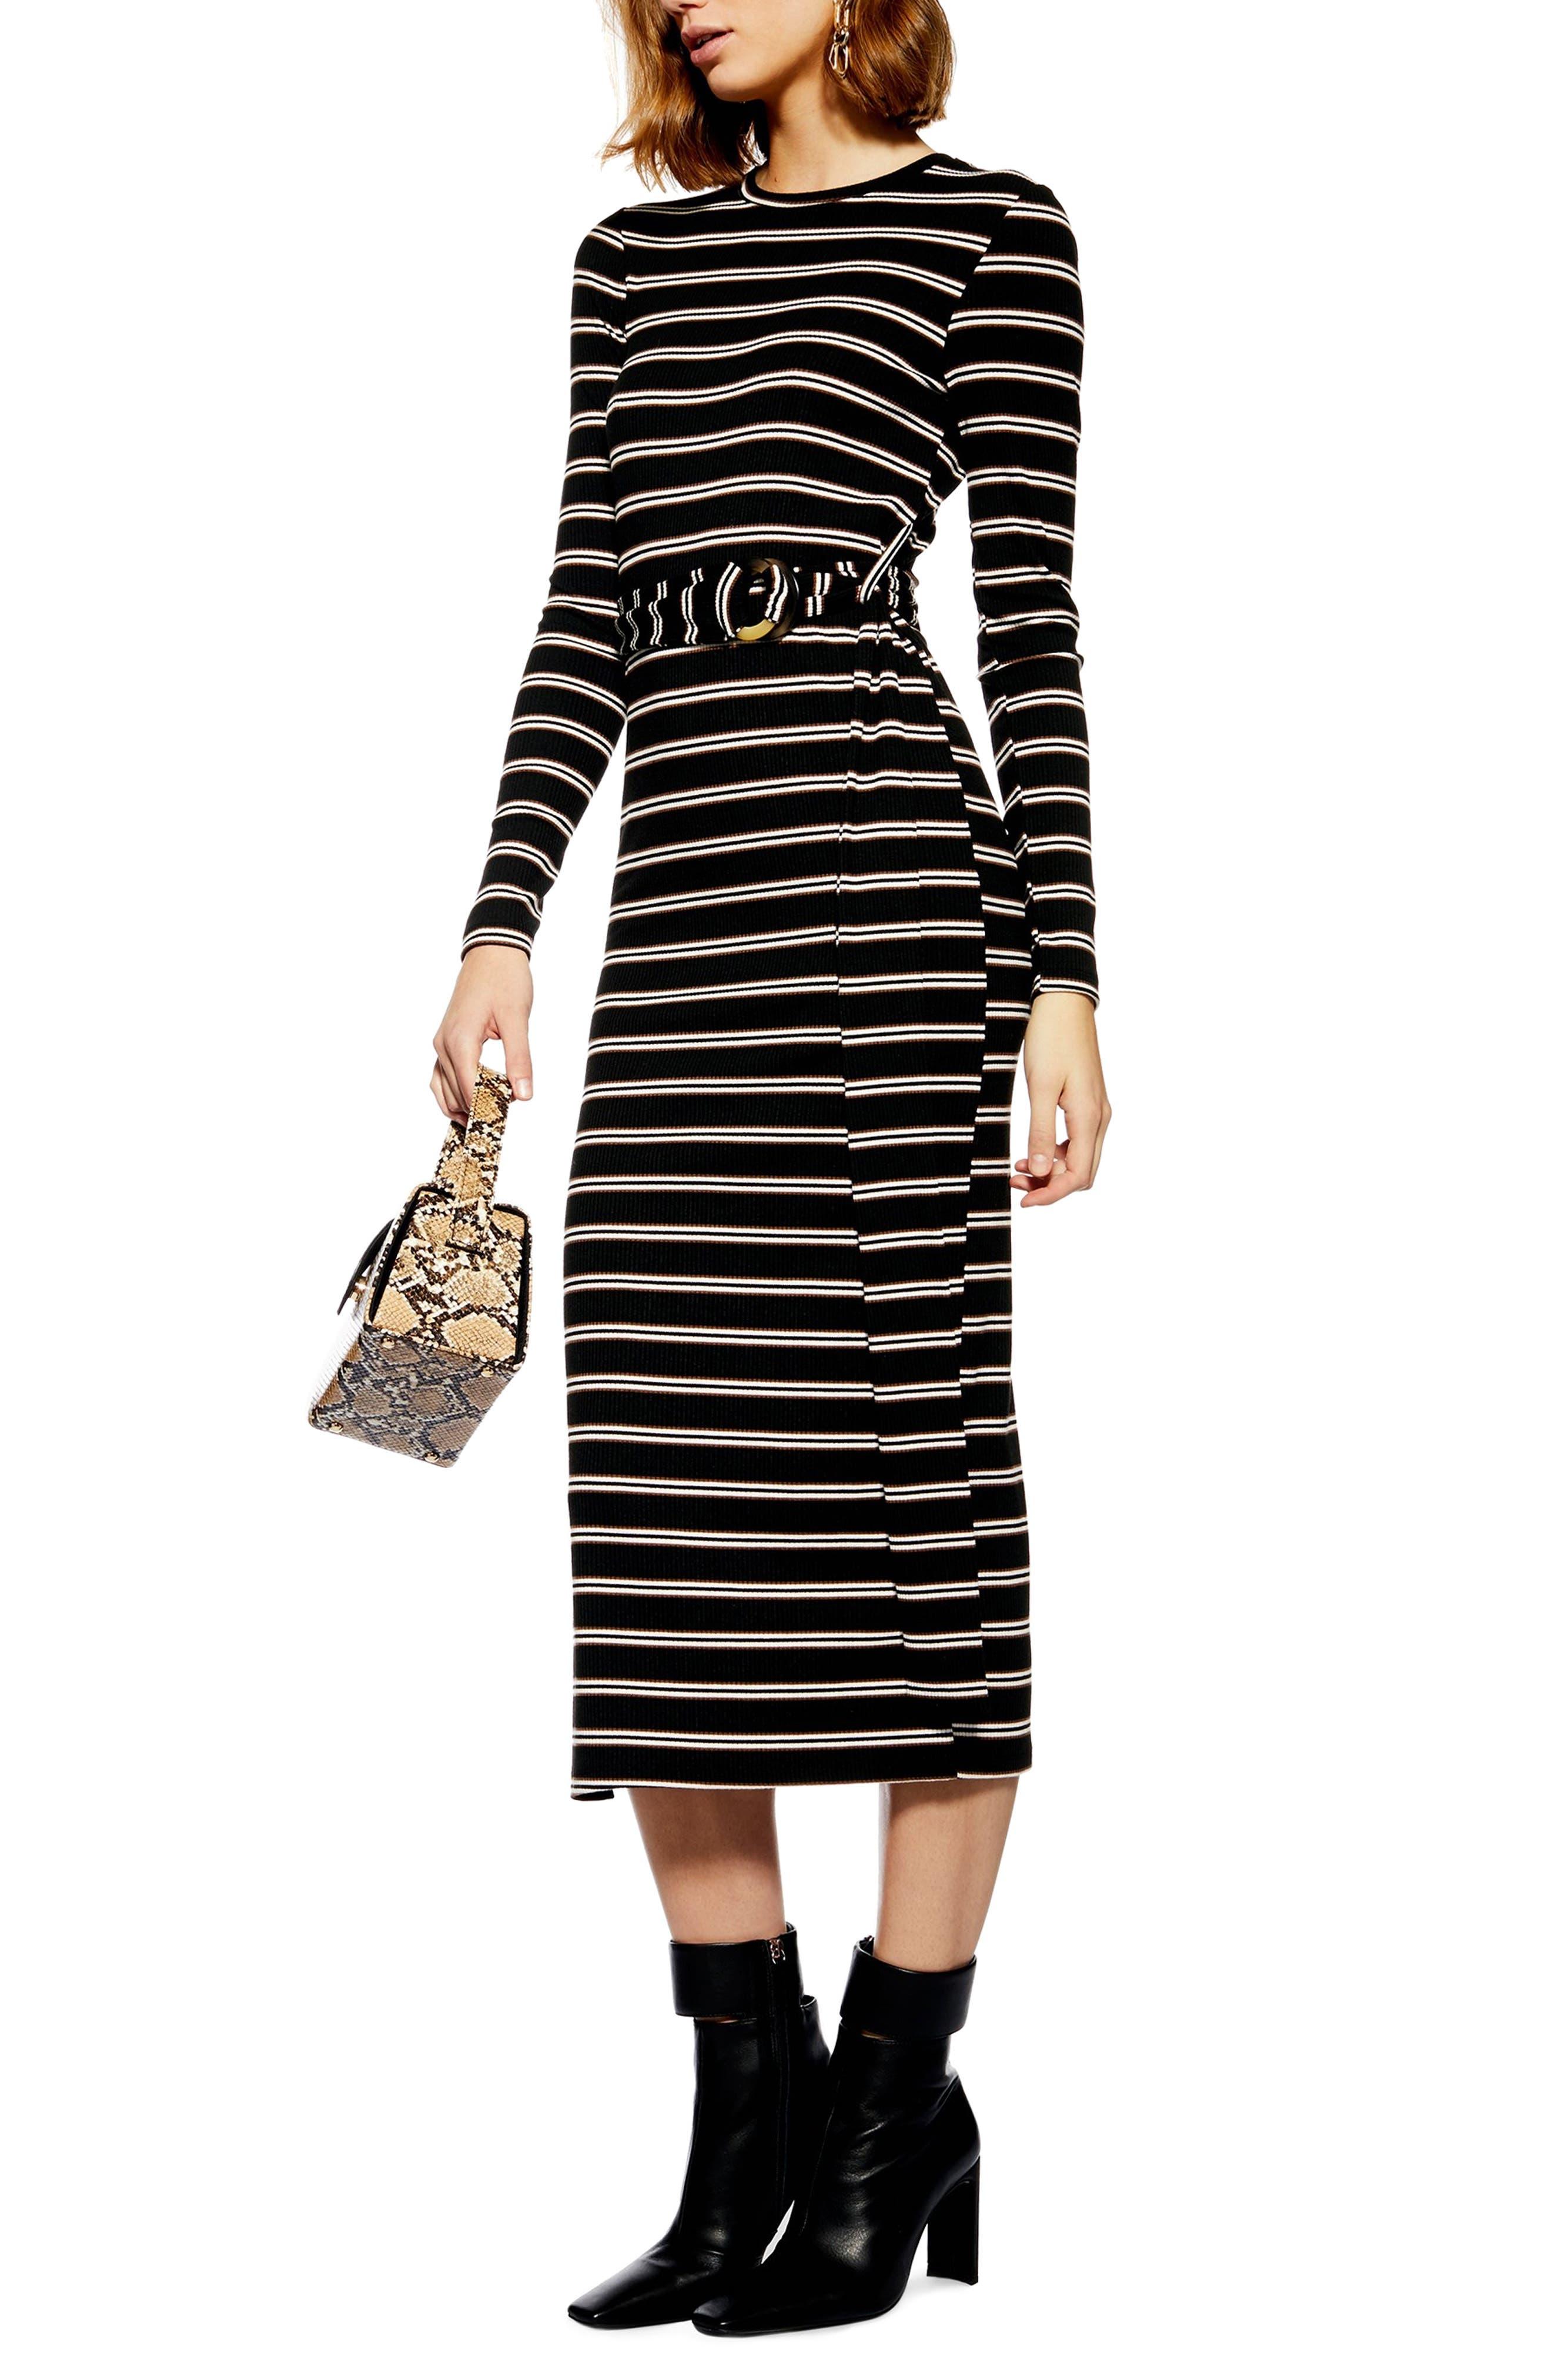 Topshop Striped Belted Midi Dress, US (fits like 10-12) - Black